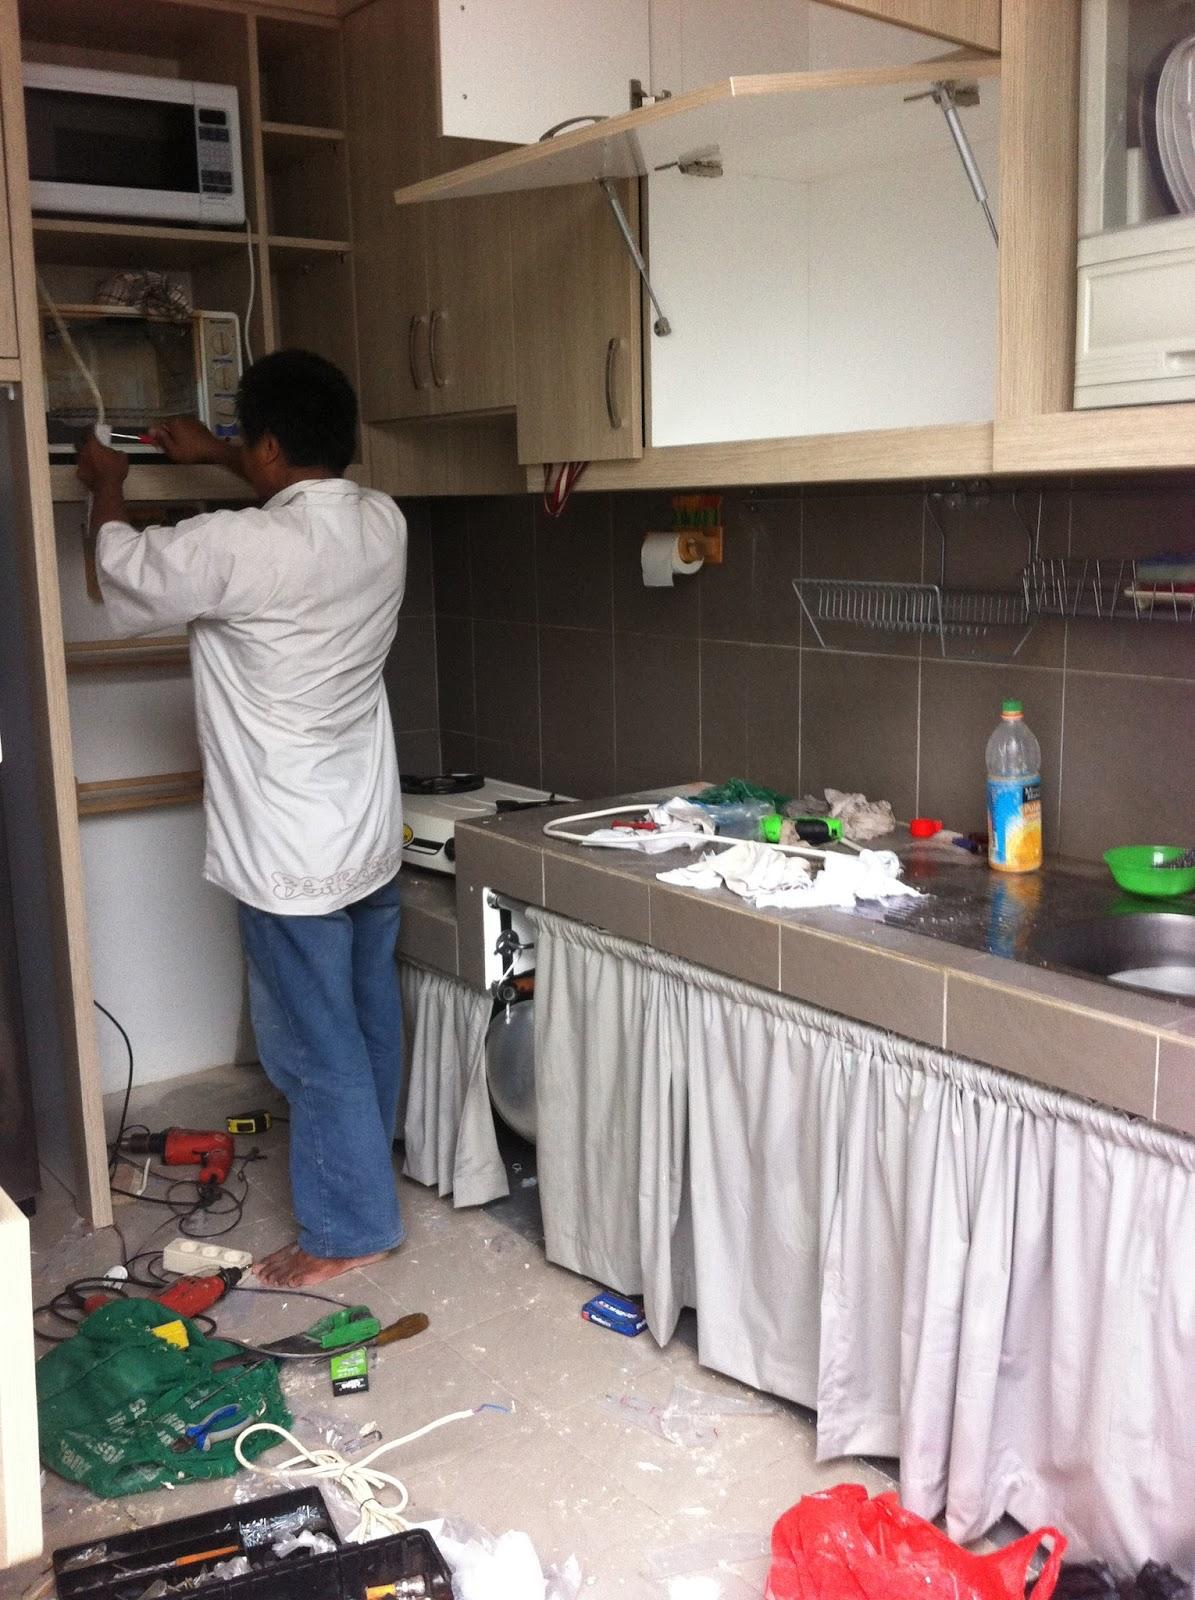 Excellent Membuat Dan Mendesain Kitchen Set Ala Ikea With Ikea Marmer.